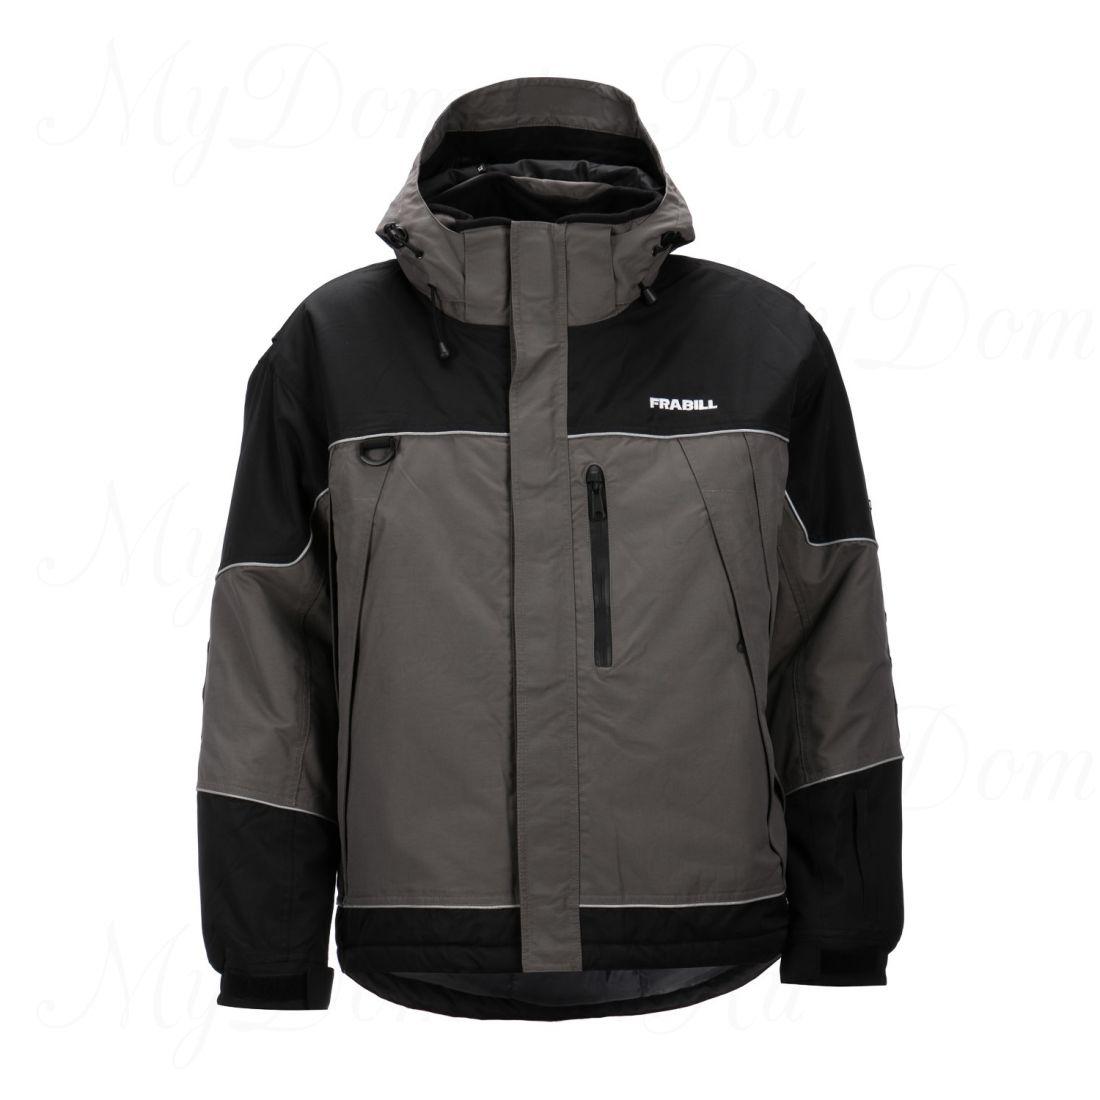 Куртка зимняя Frabill FXE SnoSuit Jacket Gray размер 3XL